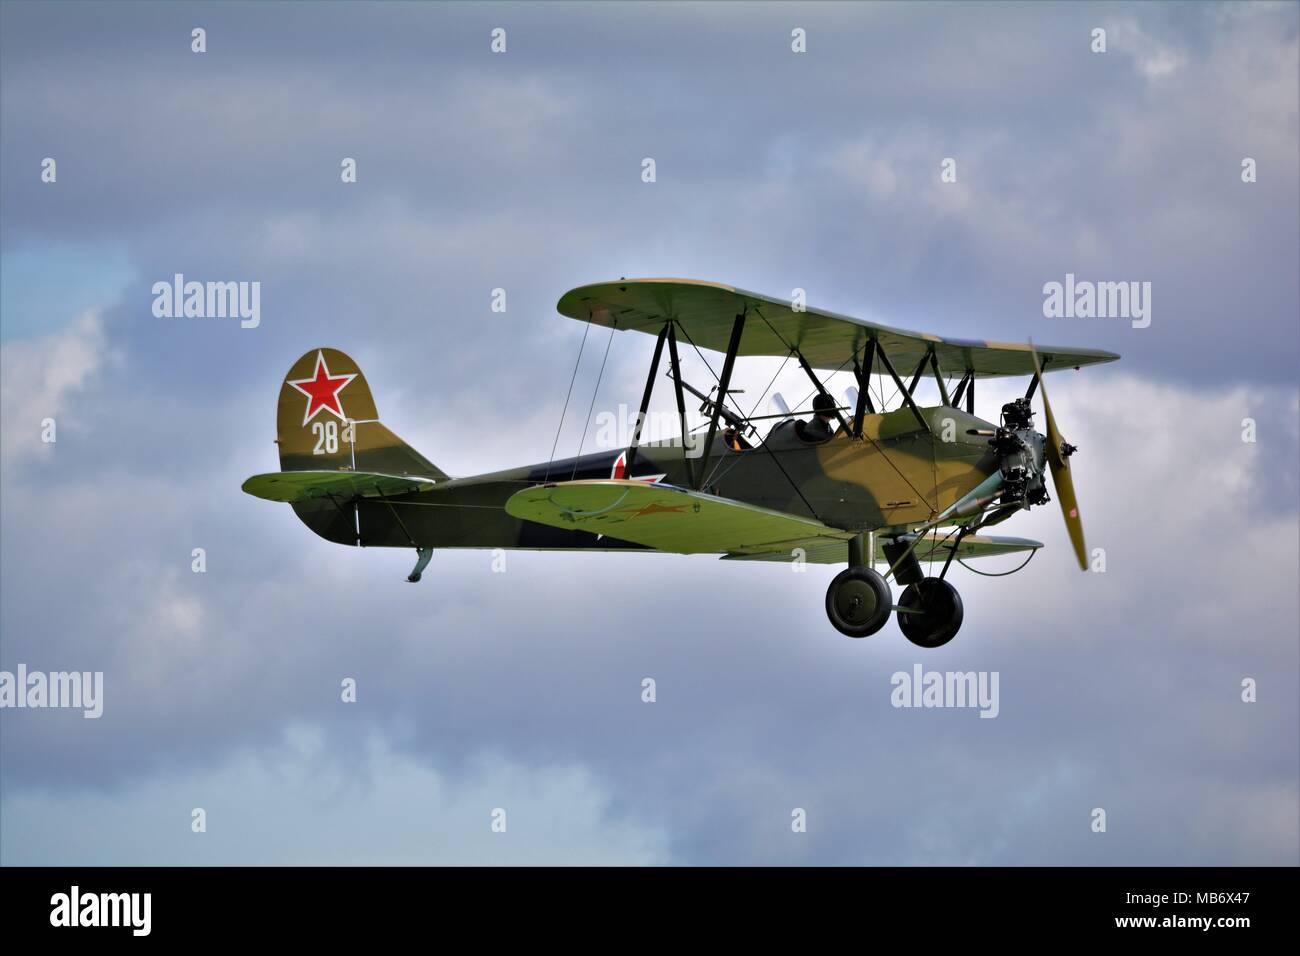 Polikarpov PO-2 Russian bi plane - Stock Image